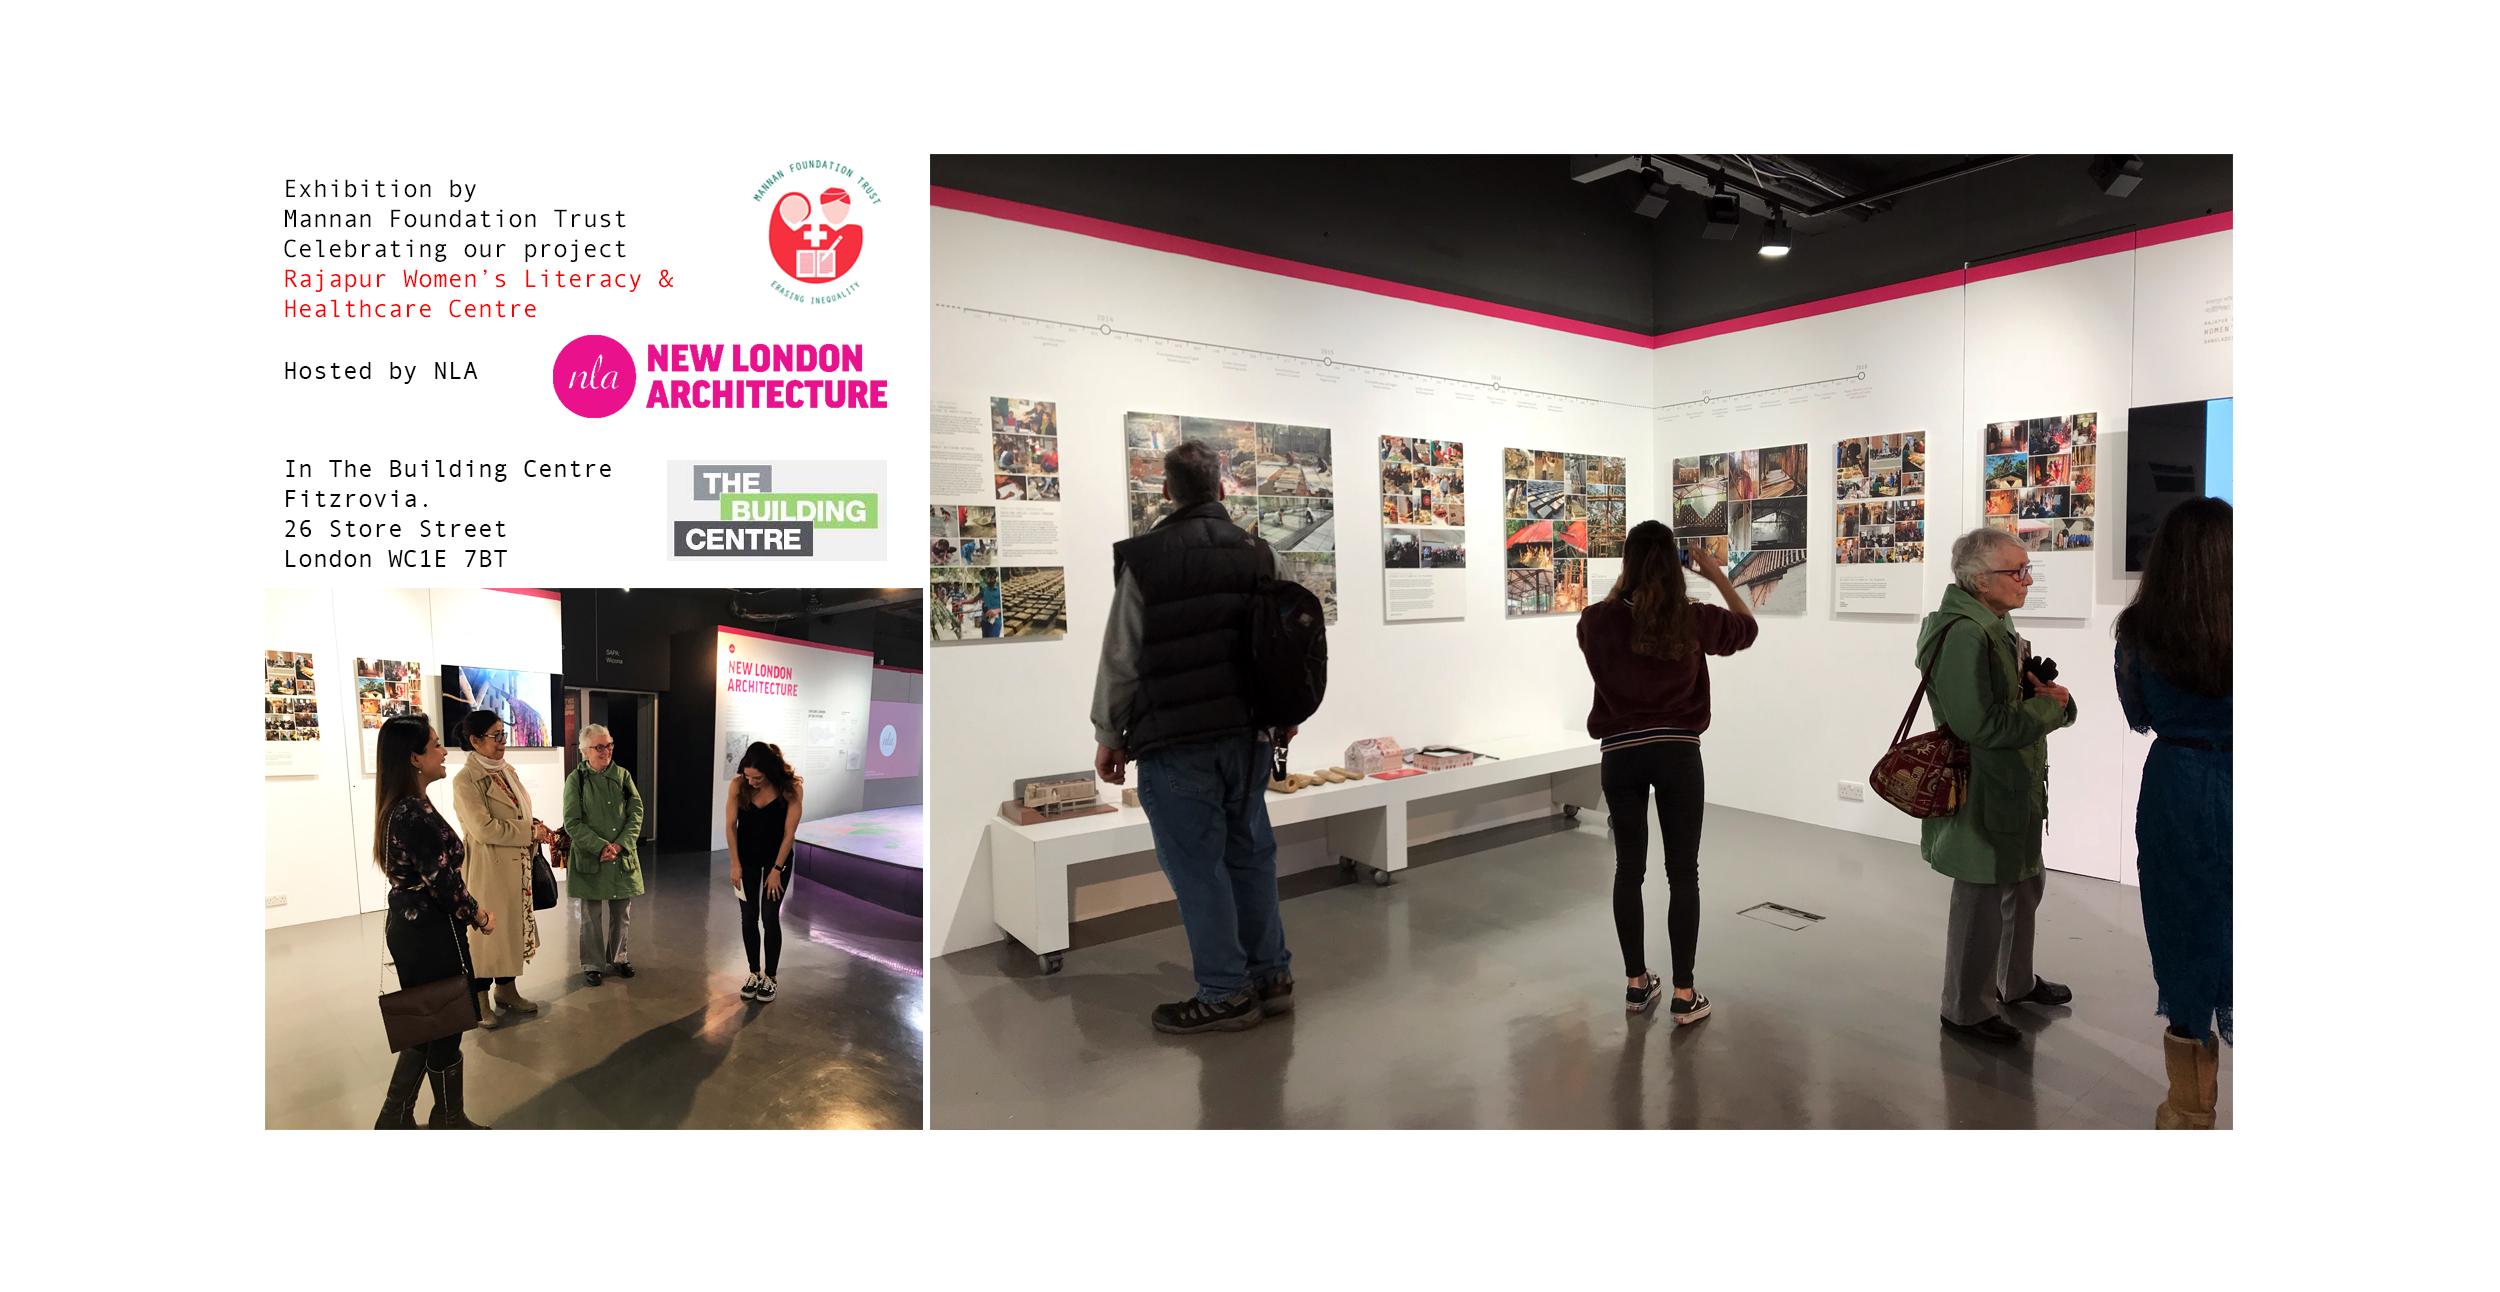 NLA_Exhibition_2018.03.10.jpg